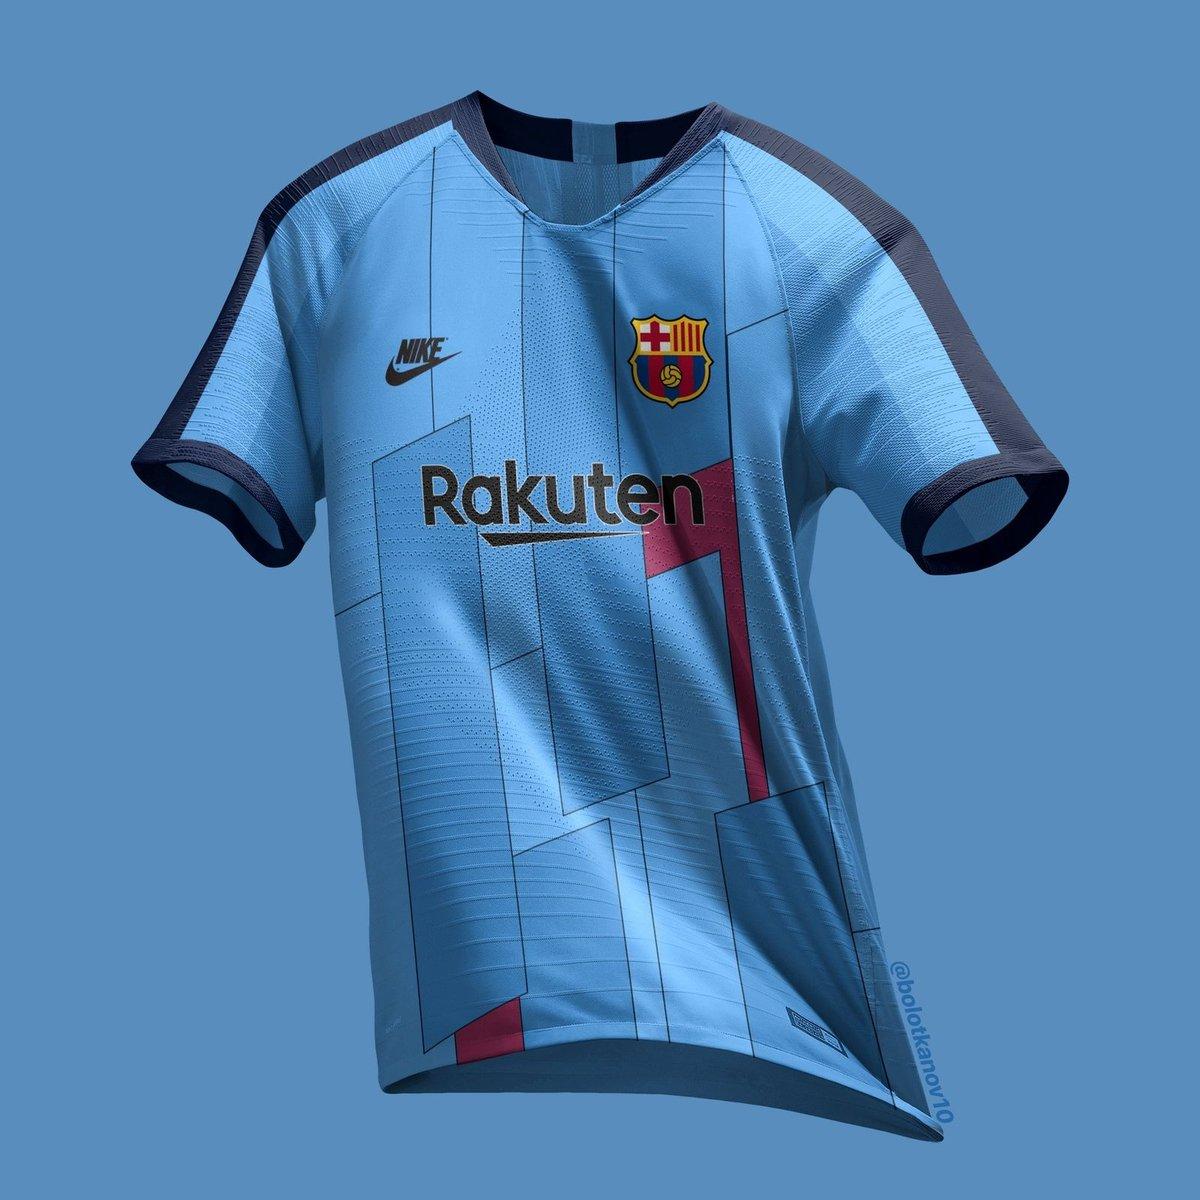 הערכה אין סיכוי טקסי fc barcelona prepara 2 jerseys retro pa